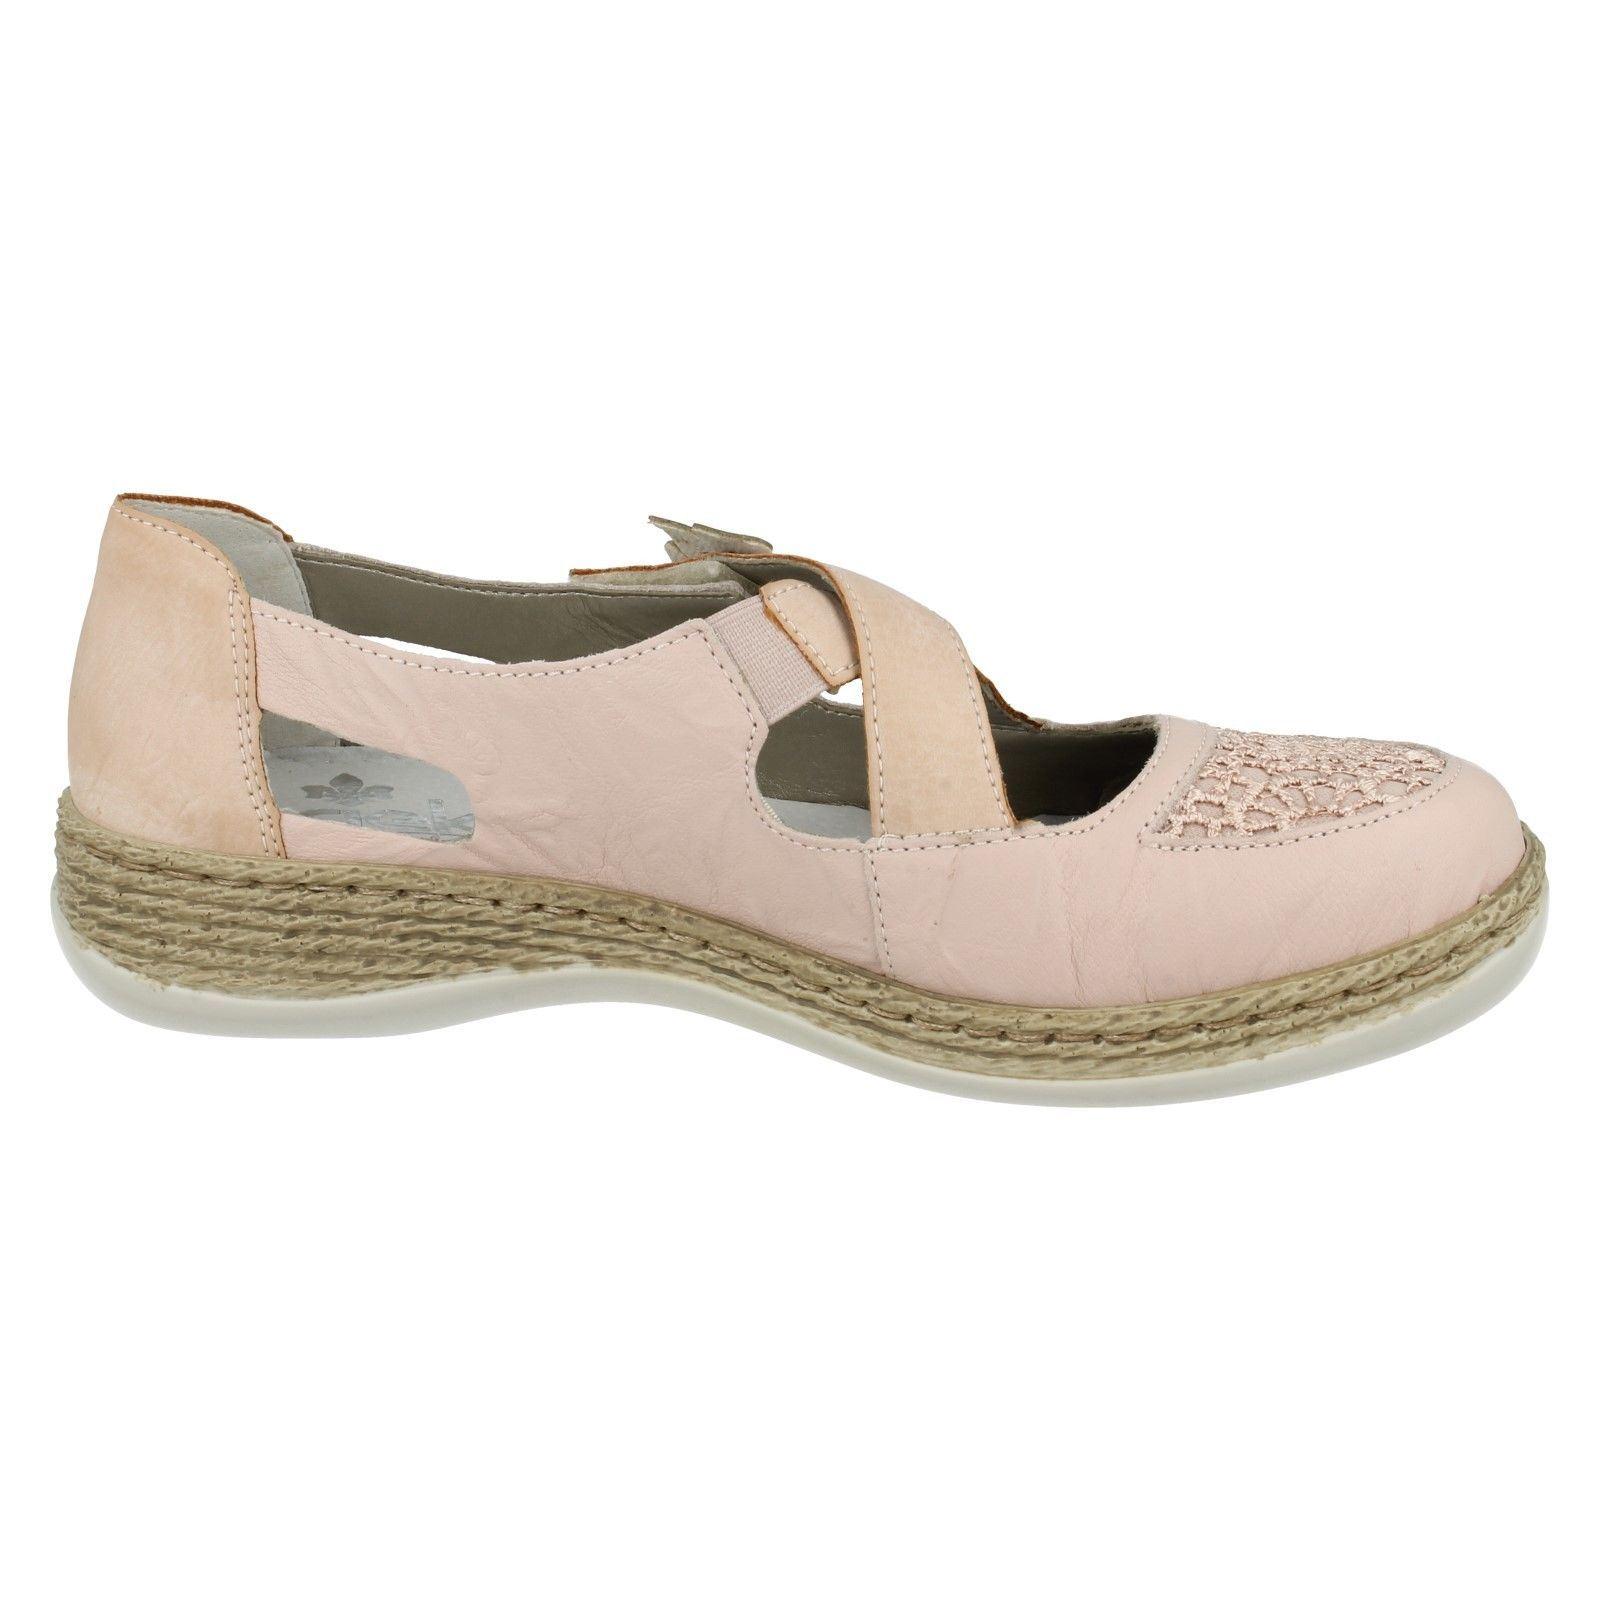 Ladies Le Rieker Rosa Style 464h0 Flats Jane Mary rrxTIB